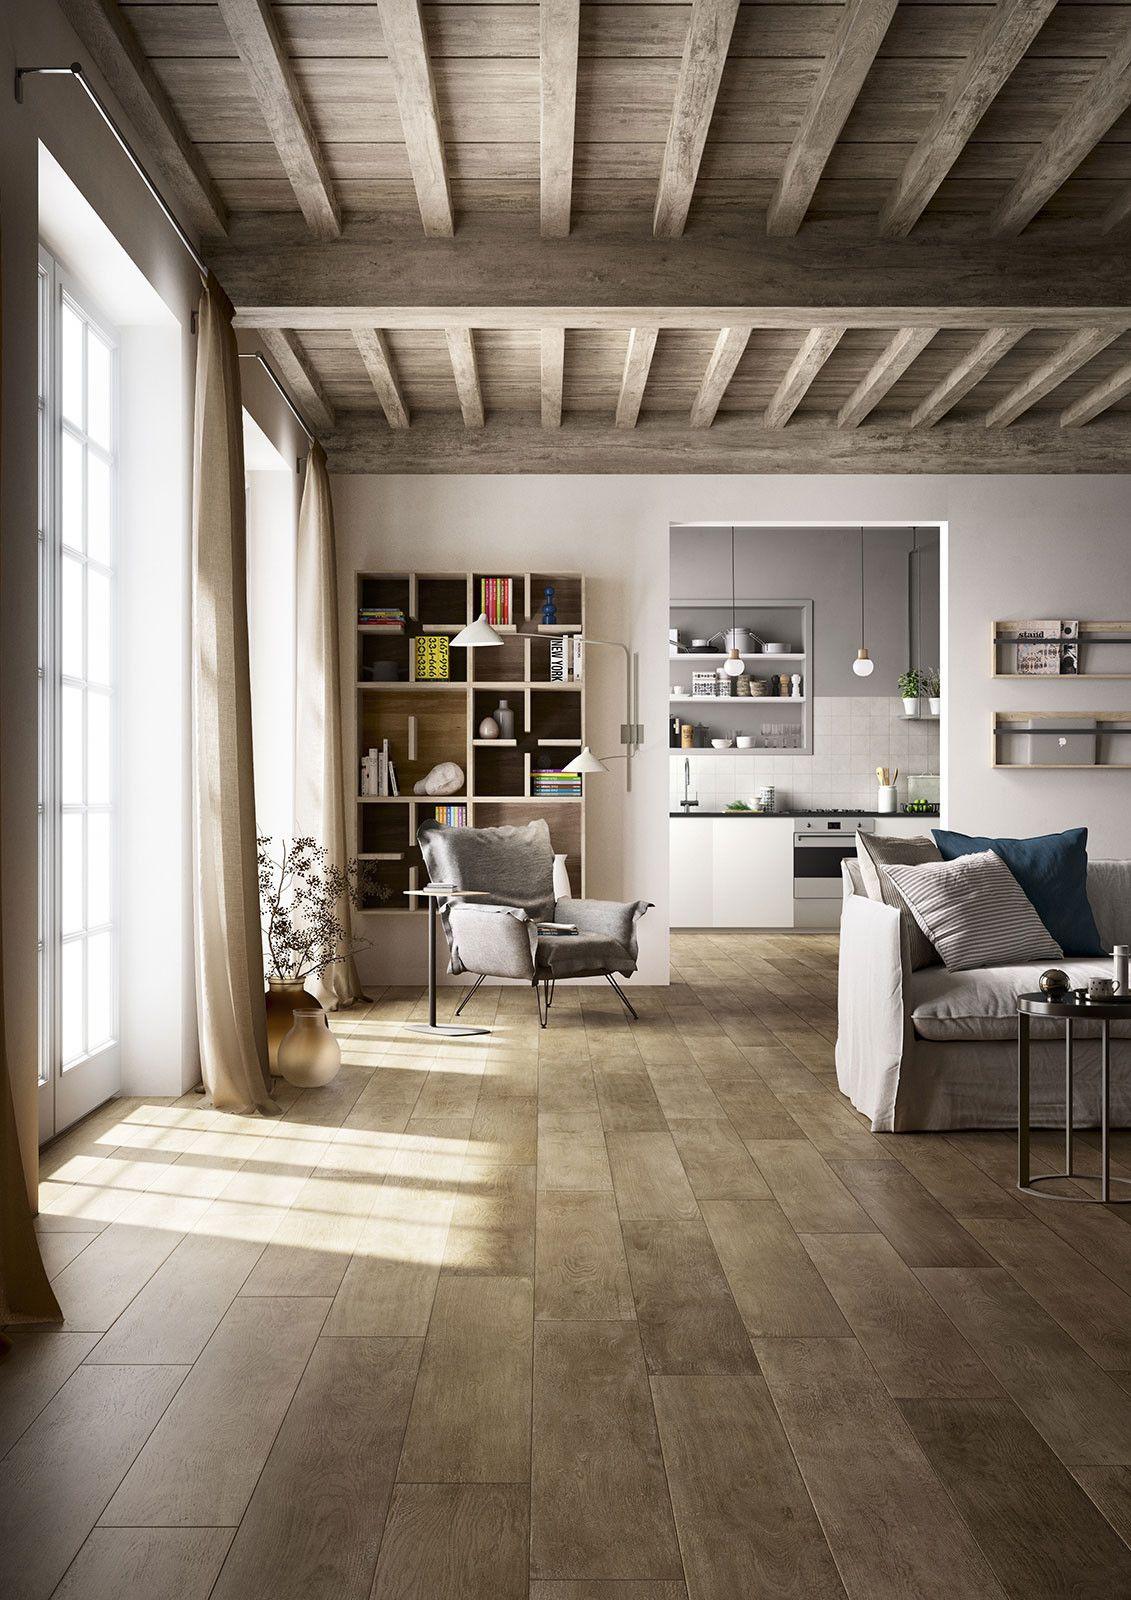 Marazzi Fliesen marazzi treverktime brown 20x120 cm mm8r gres legno 20x120